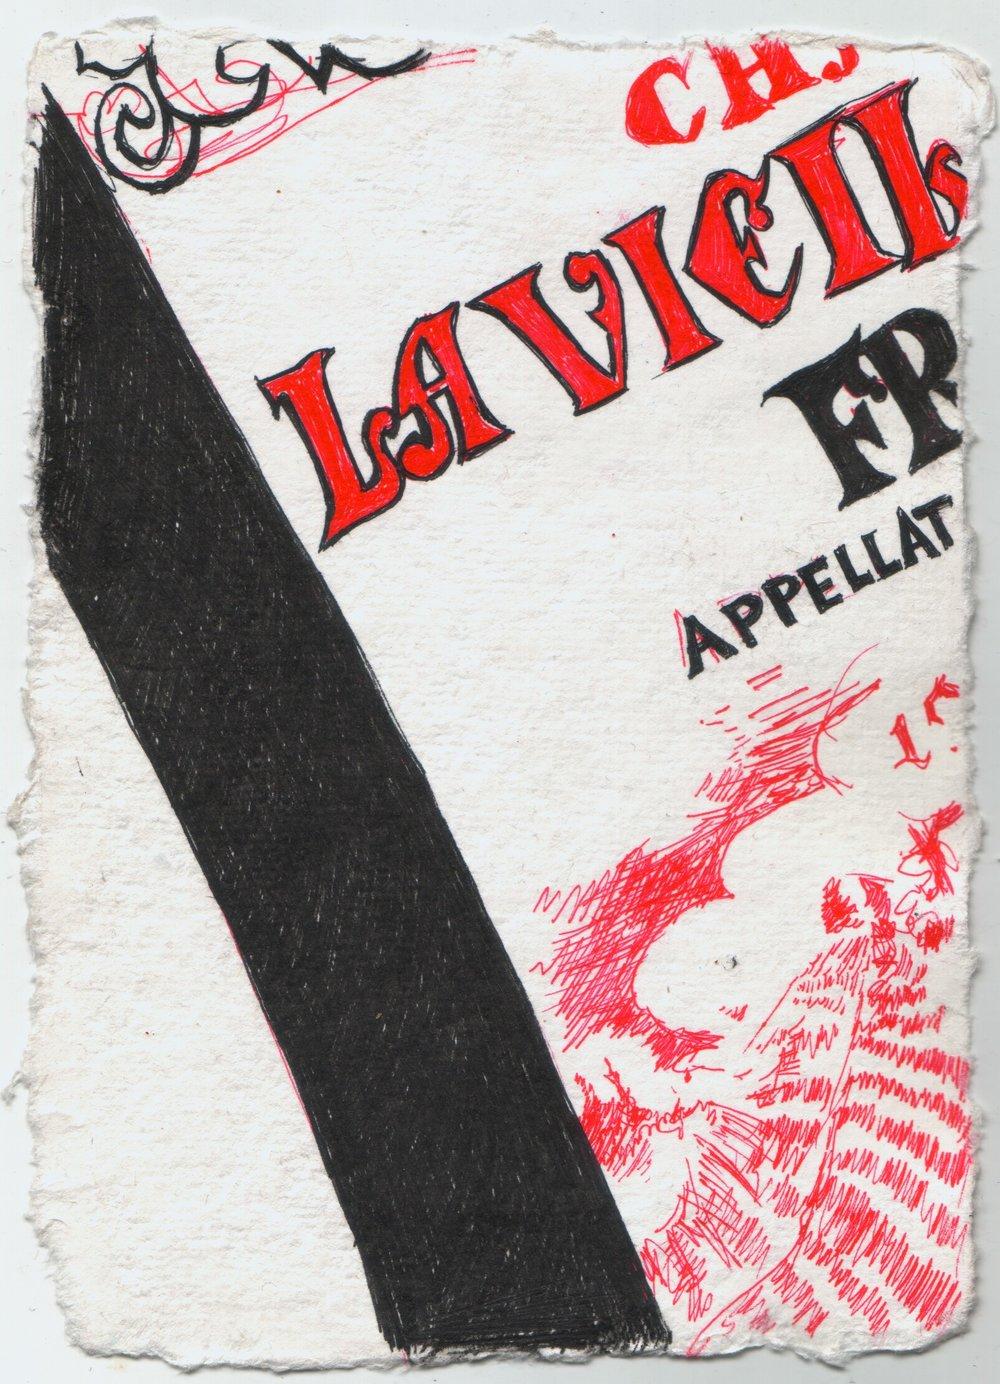 LaVielle.jpg